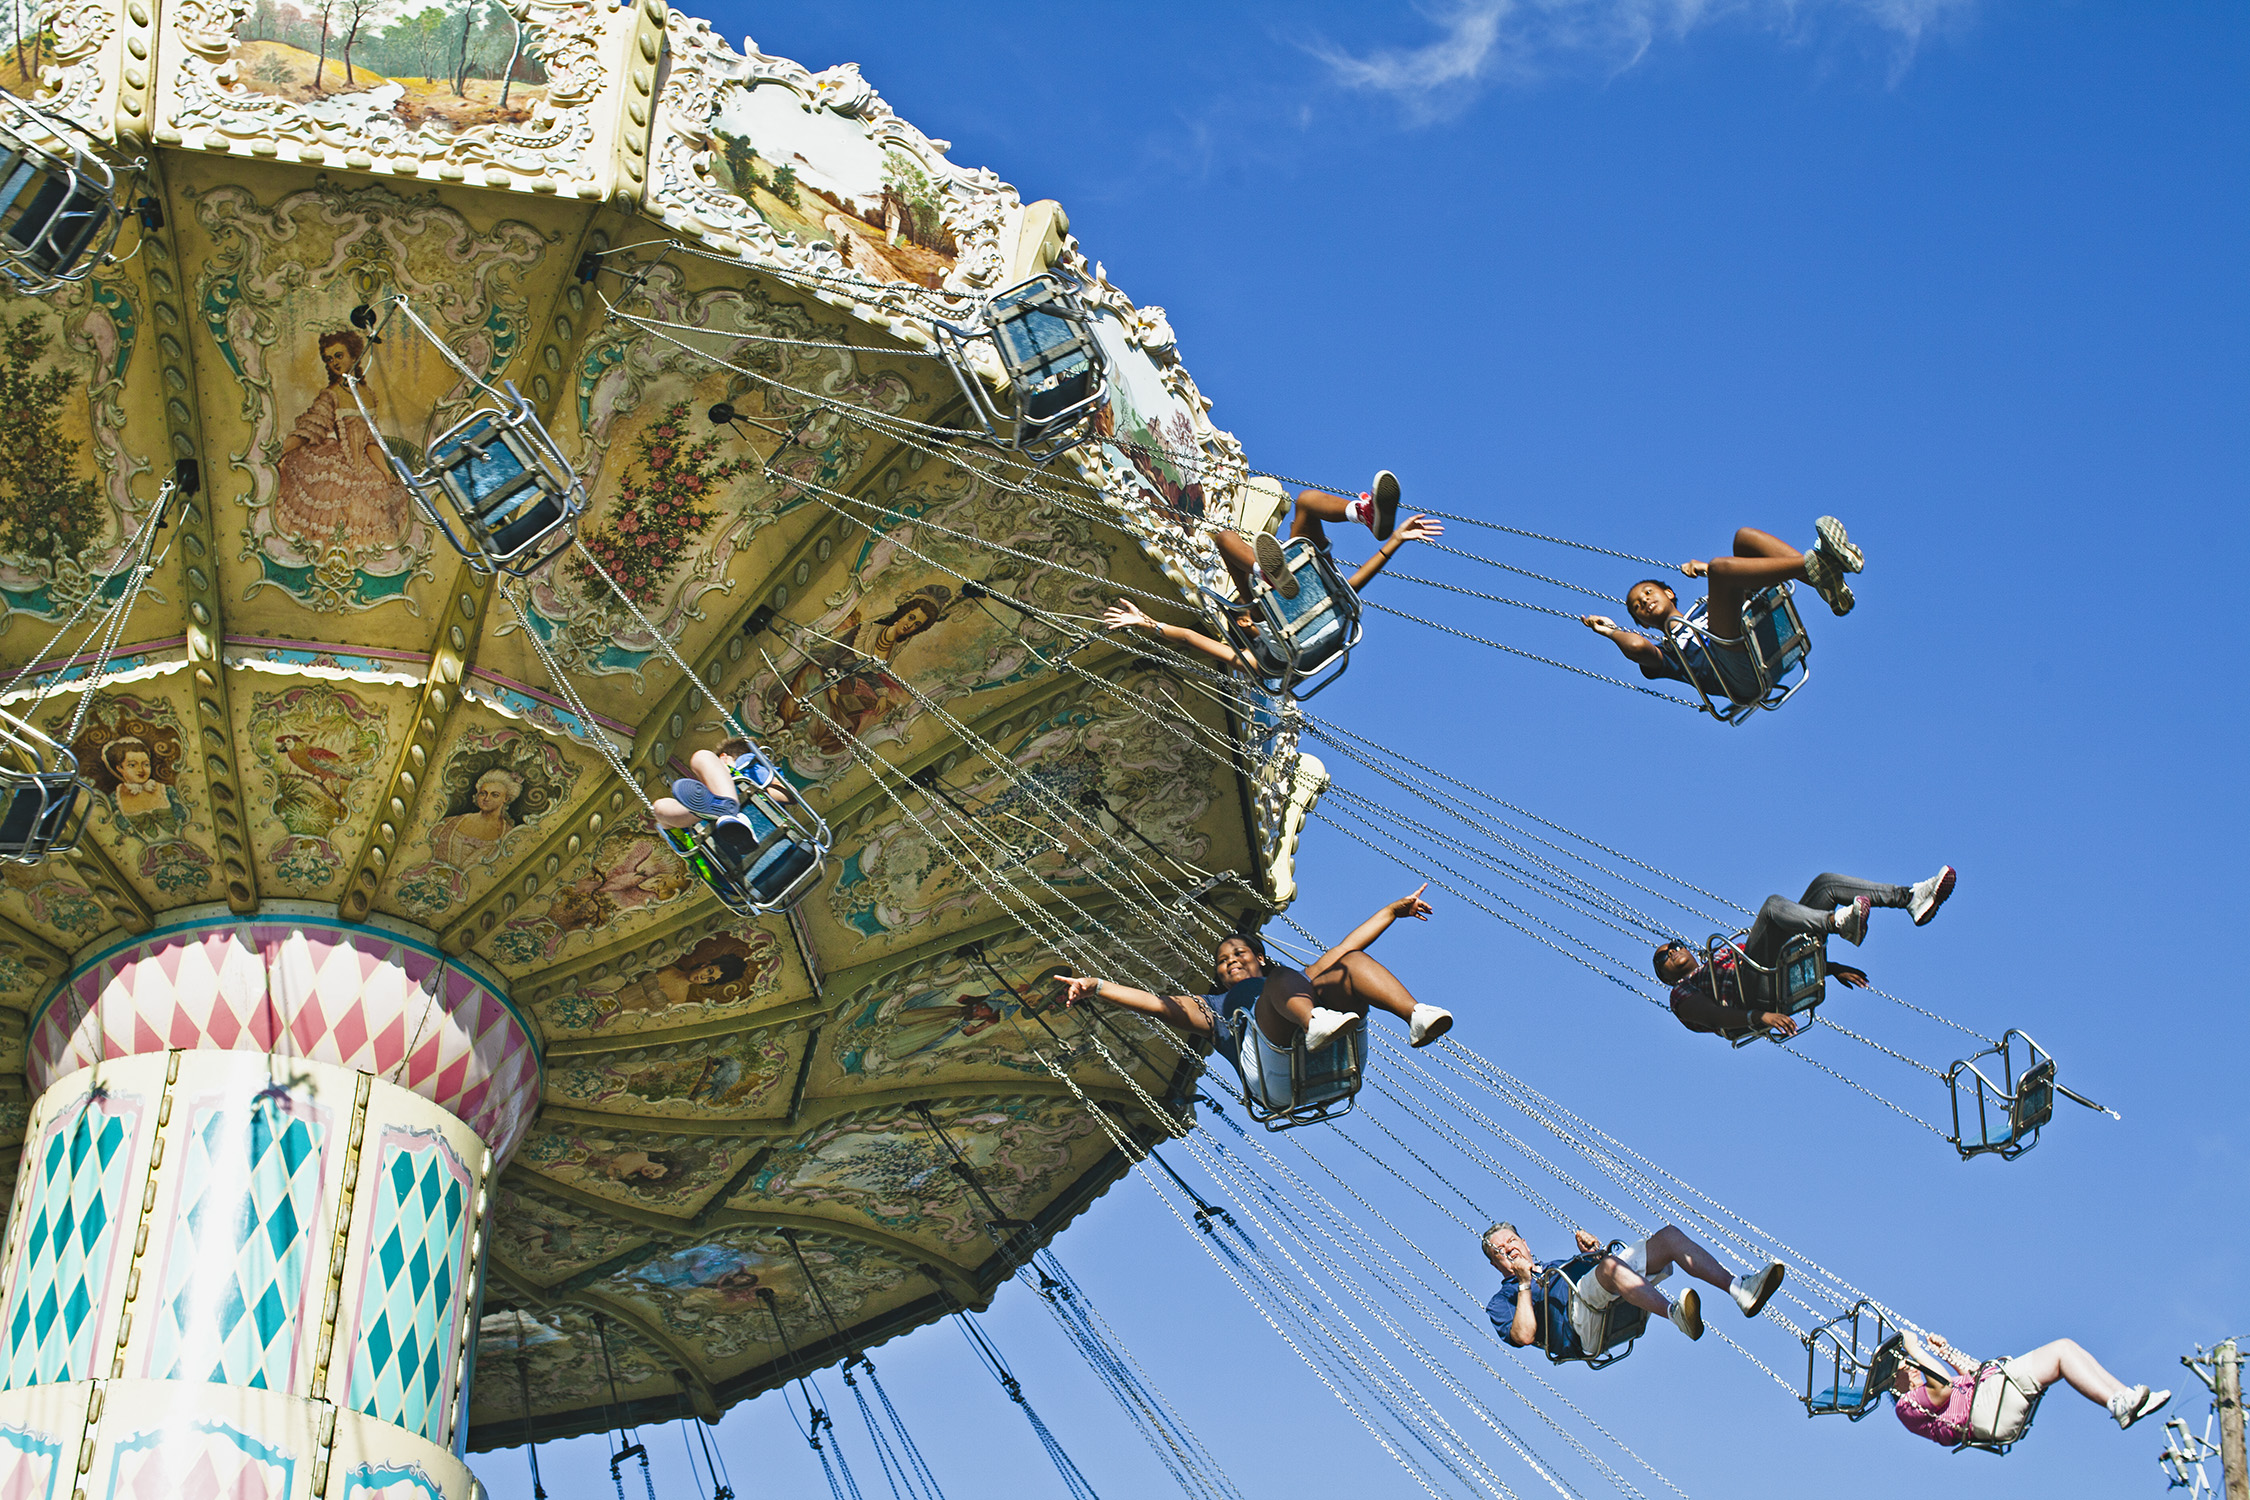 lifestyle-editorial-washington-dc-malek-naz-photography-montgomery-county-fair-swing.jpg